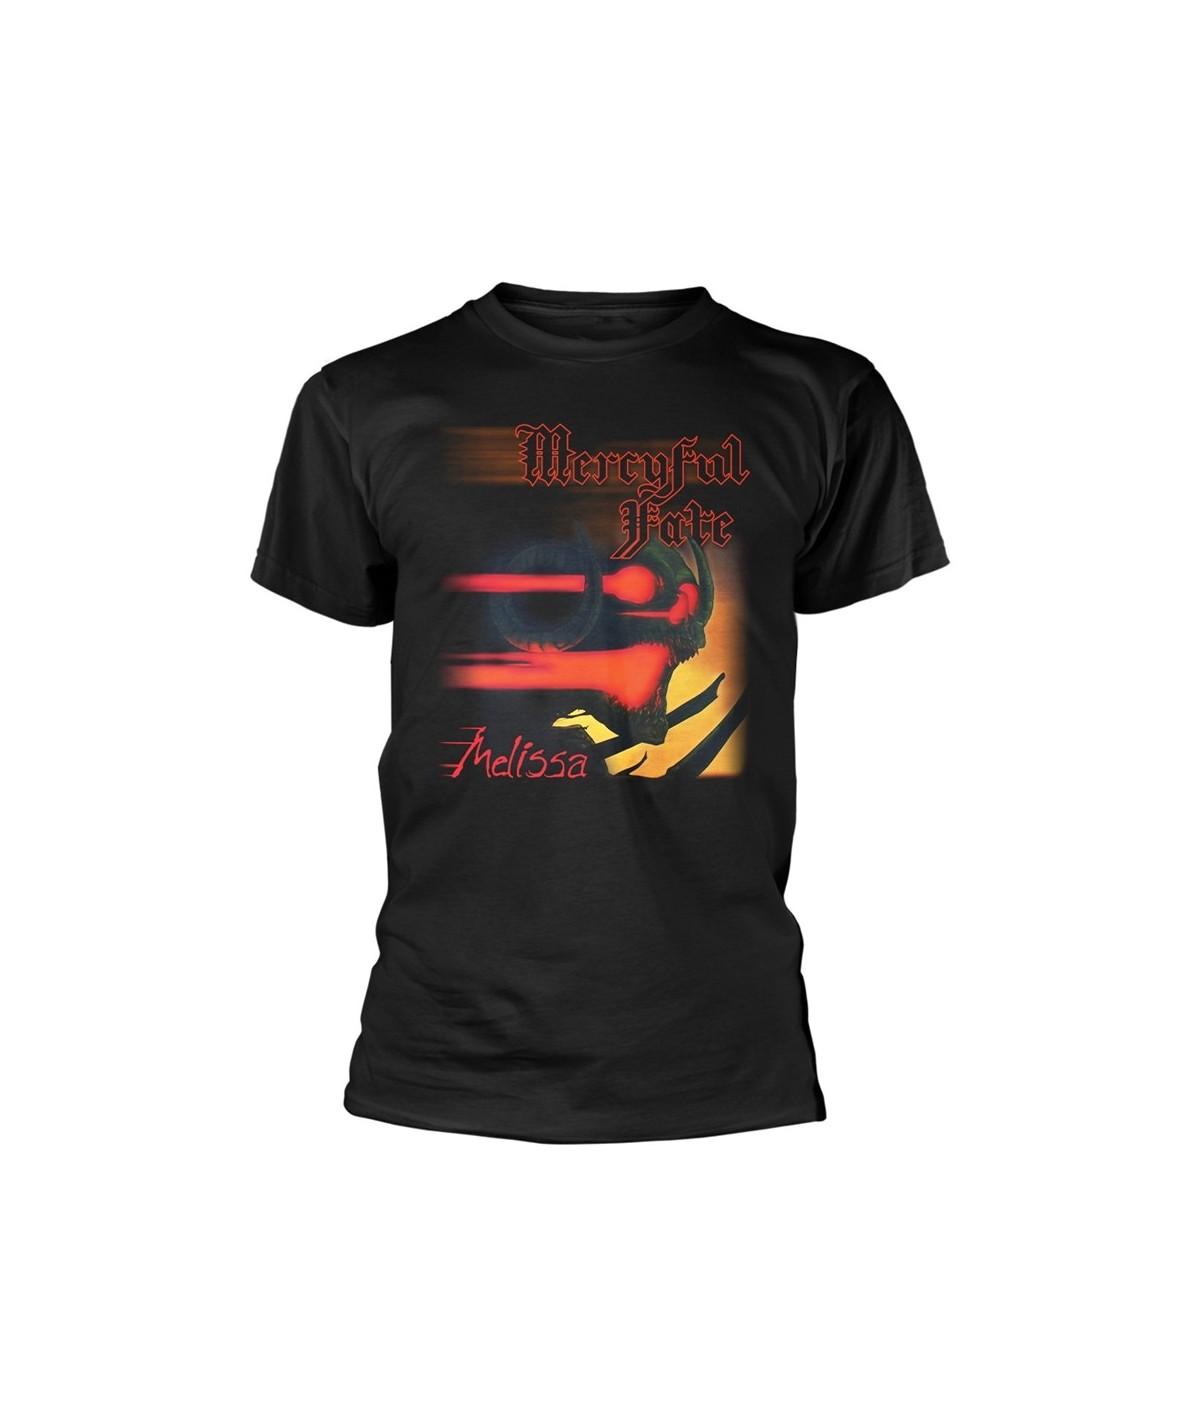 Tricou Unisex Mercyful Fate: Melissa